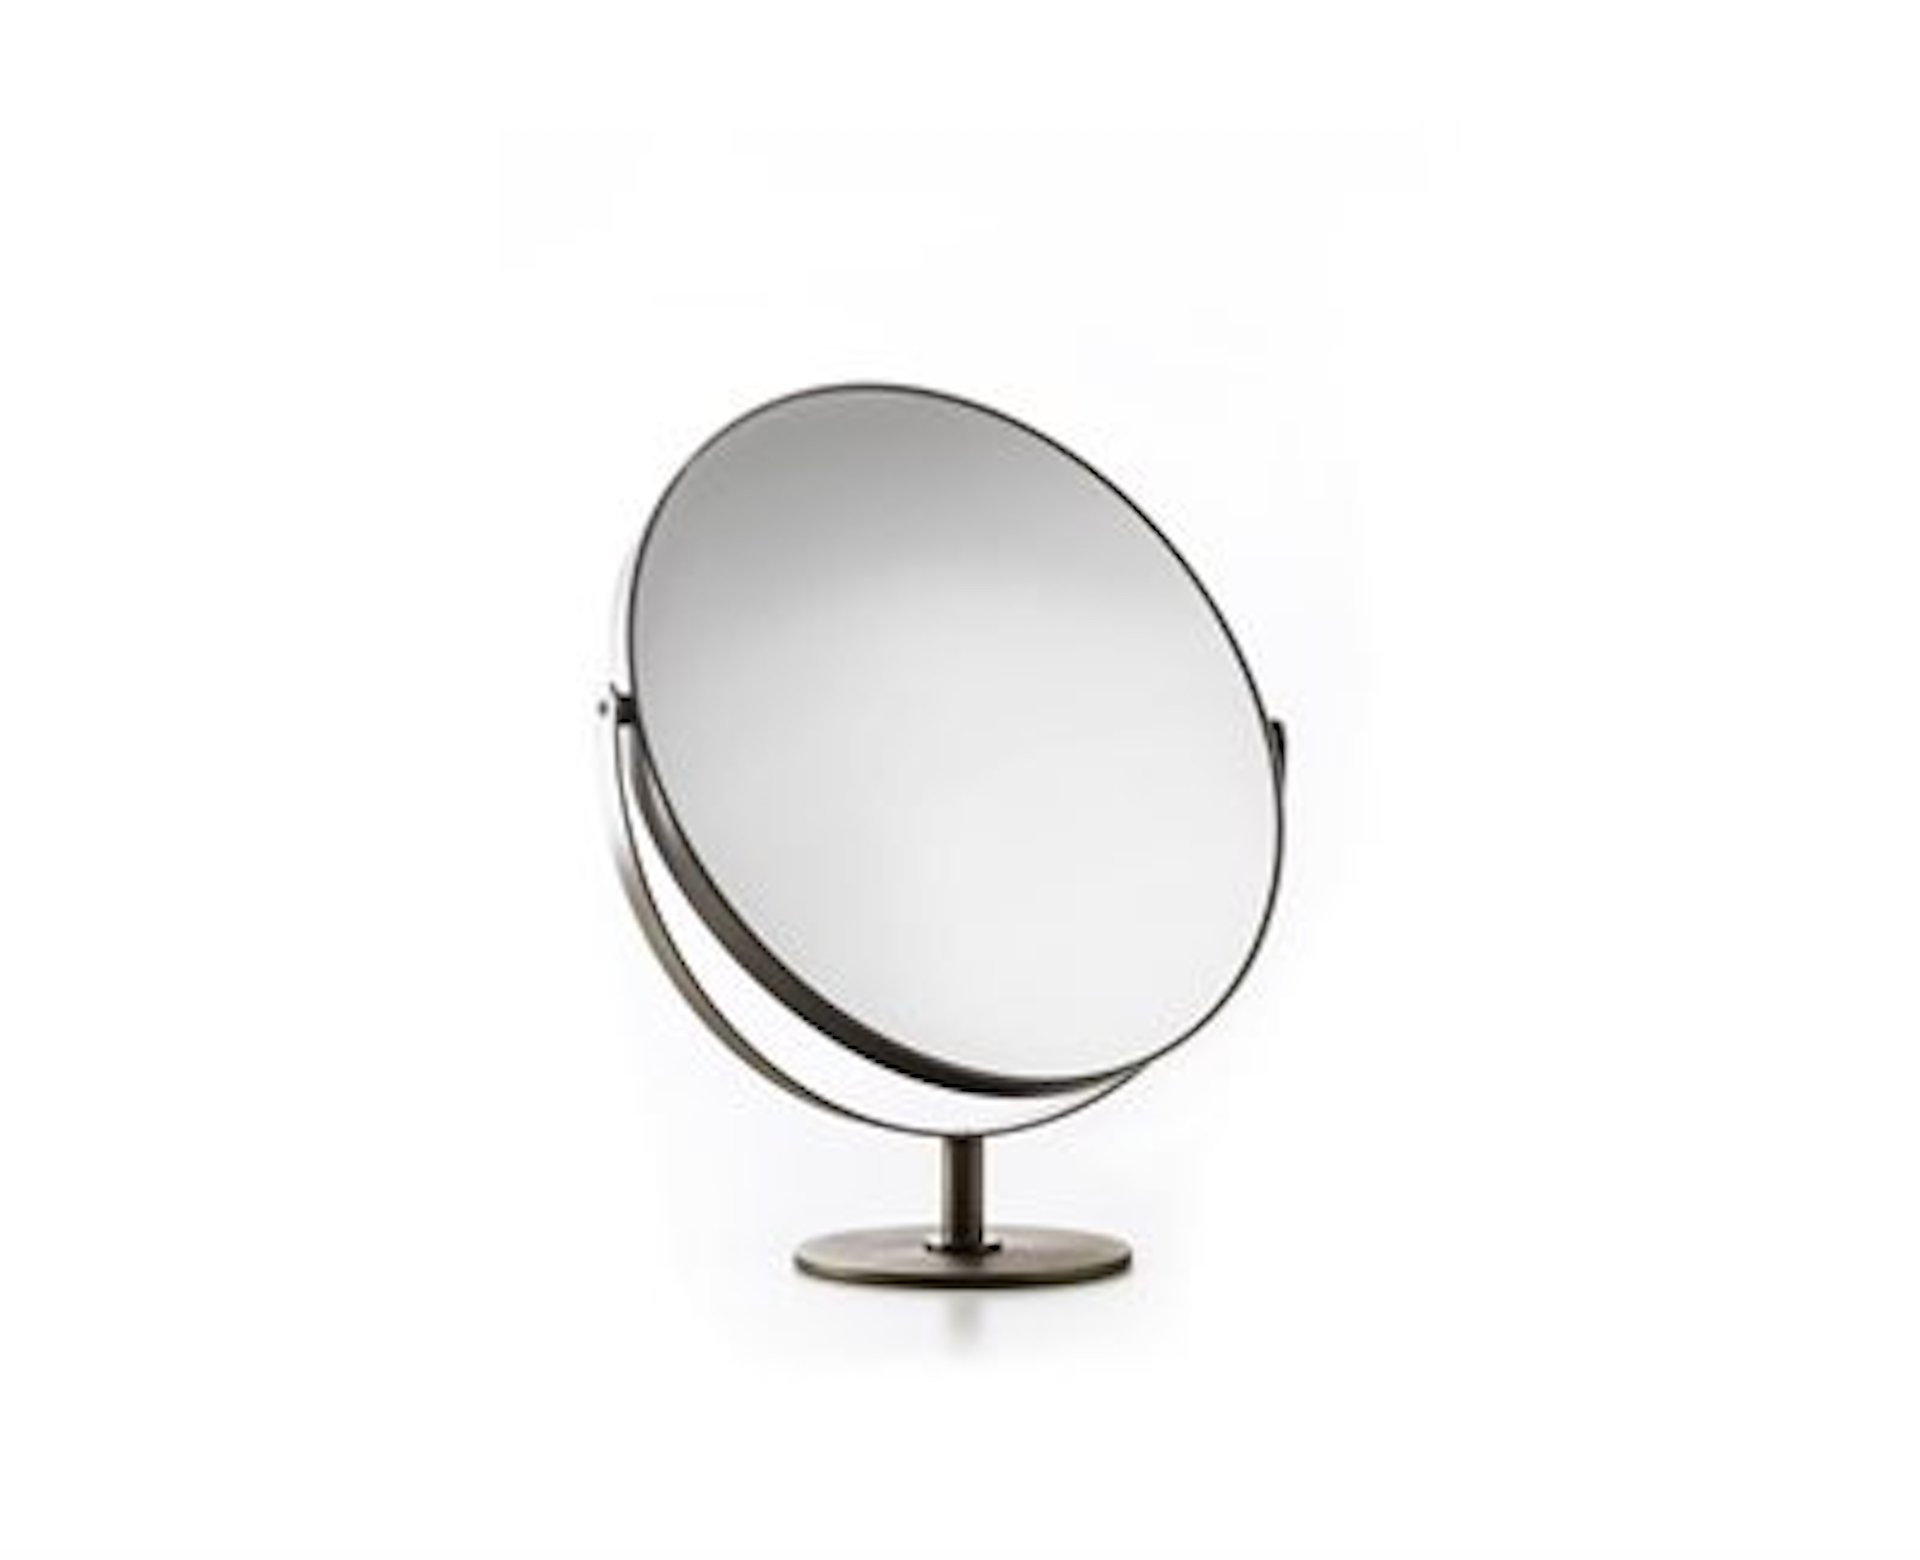 Afrodite Specchio FS Table Mirror from Porada, designed by C. Ballabio